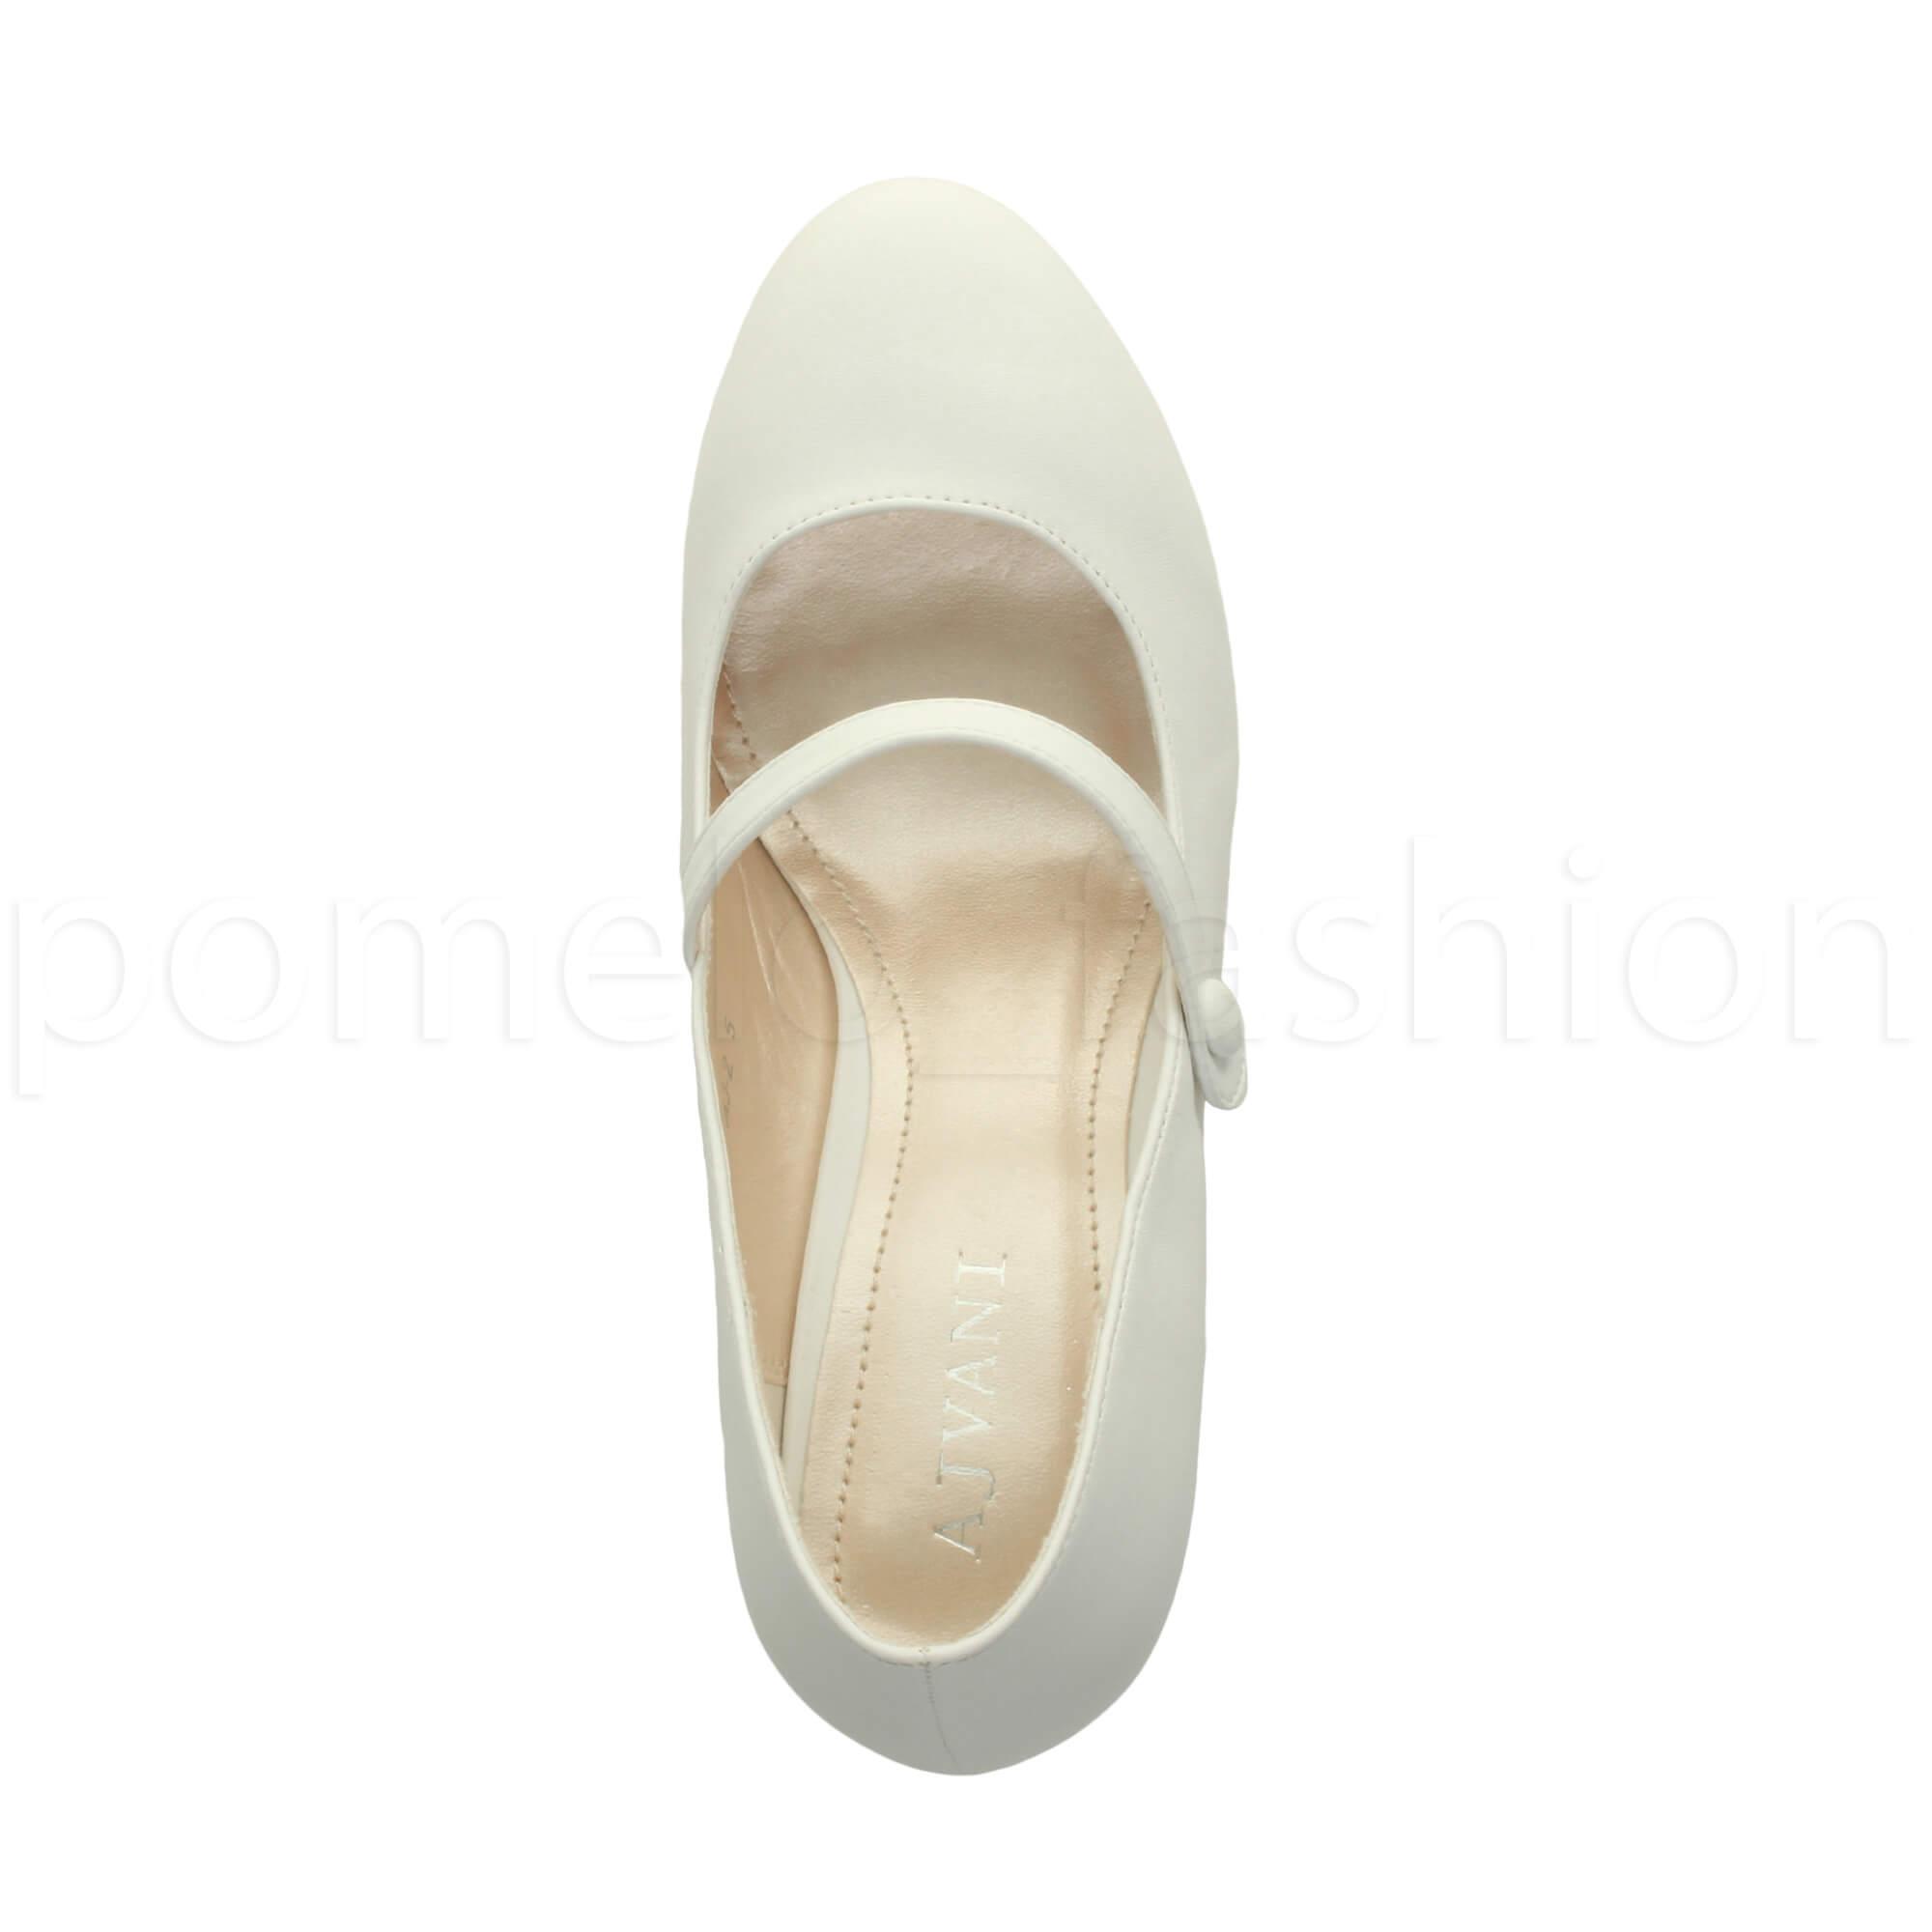 miniatura 175 - Donna basso tacco medio Mary Jane Damigella Matrimonio Pompe Scarpe Da Sera Taglia